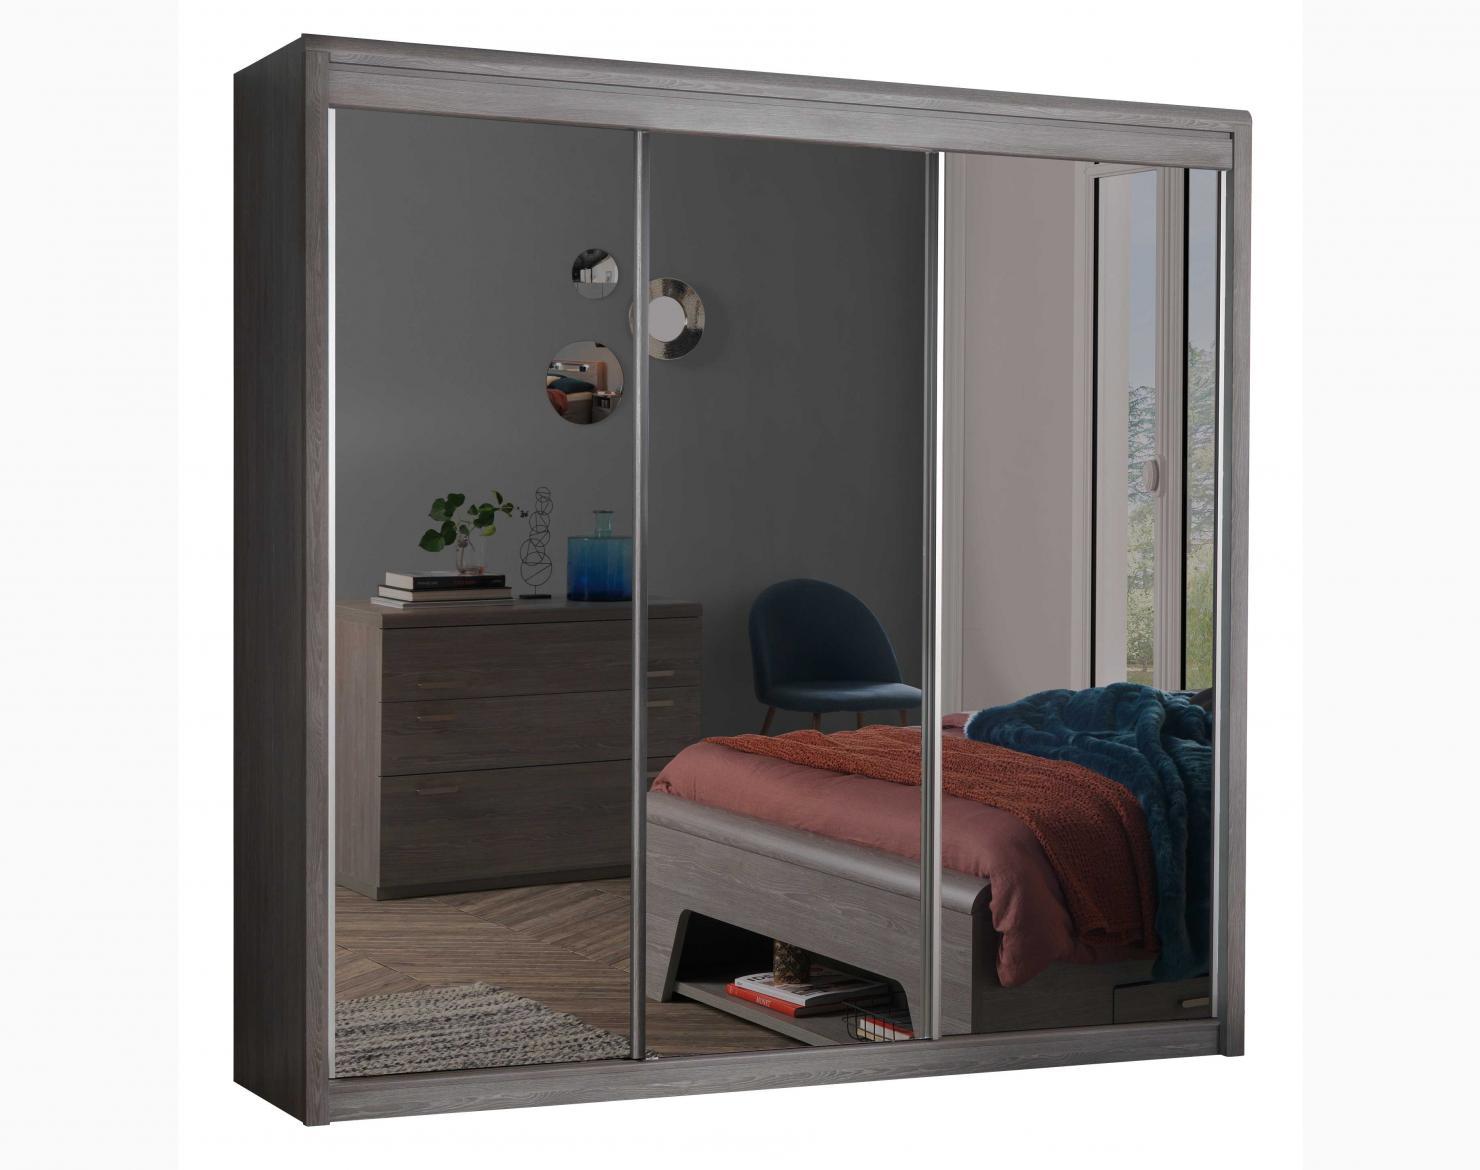 armoire 3 portes coulissantes miroirs